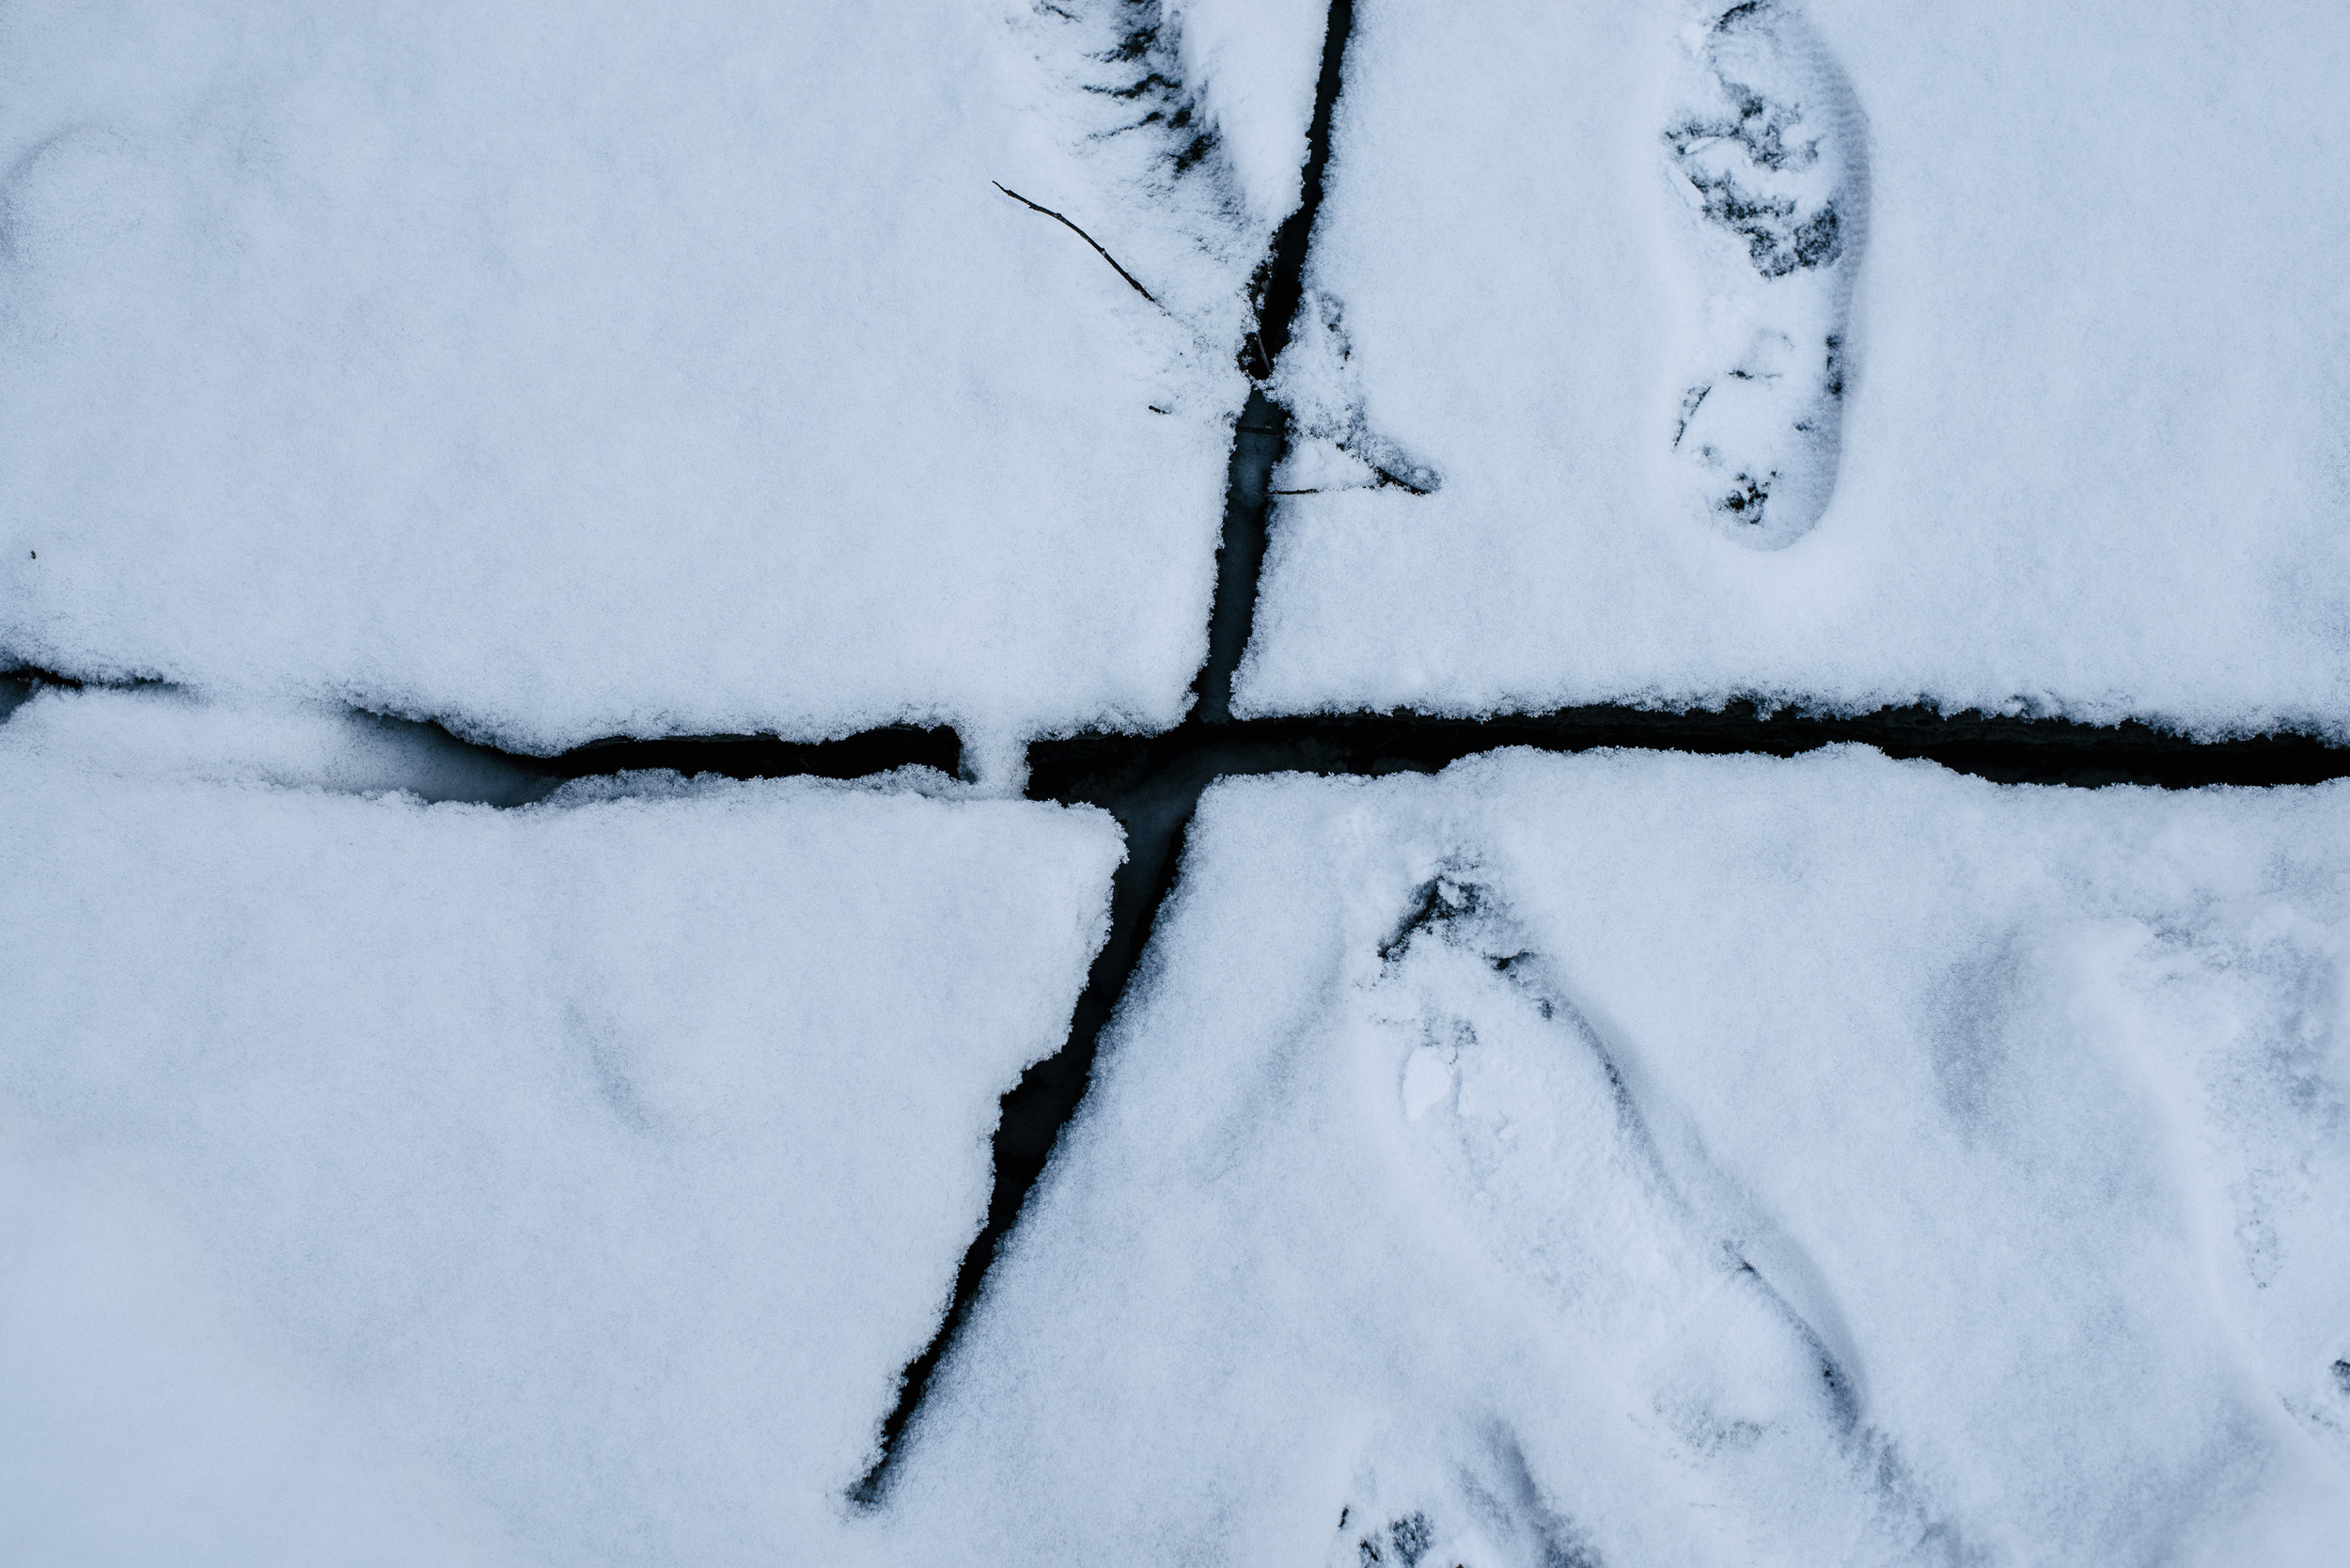 winter documentary photography viara mileva-110634vm.jpg